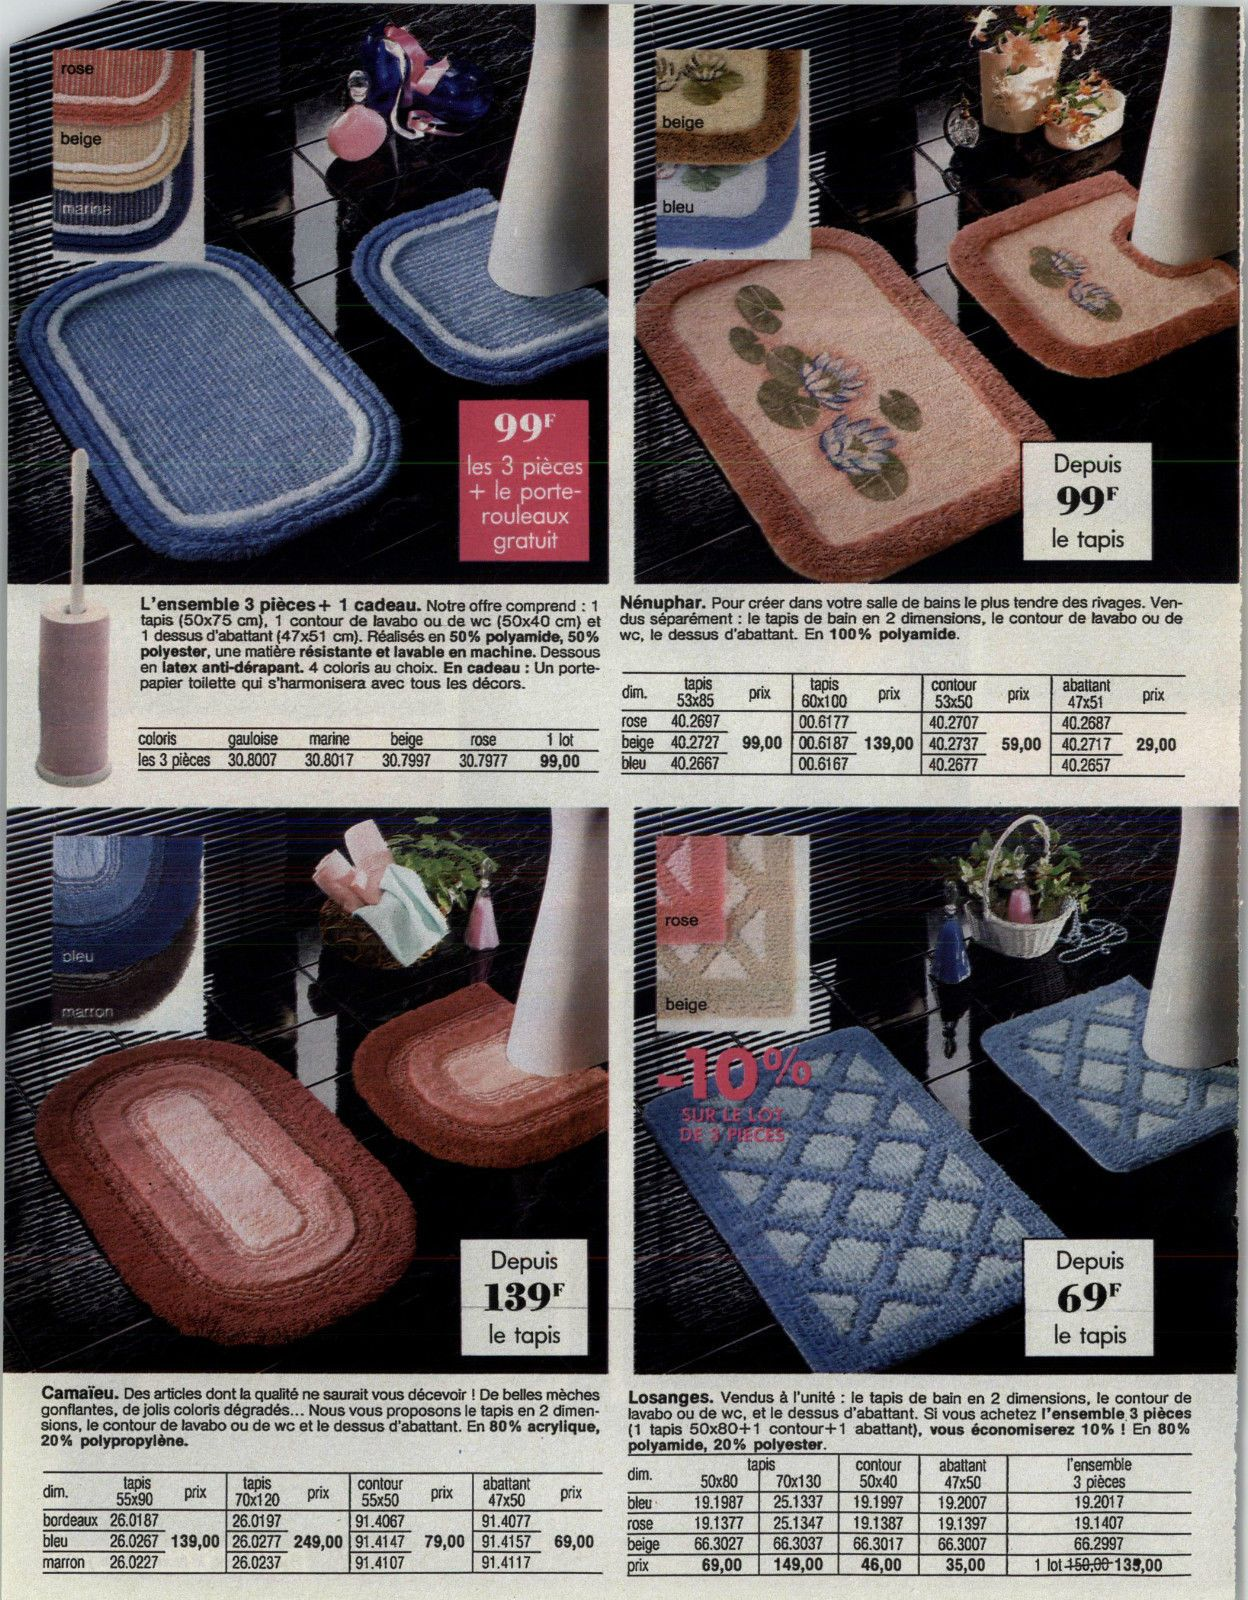 FRENCH LA REDOUTE LA BLANCHE DAXON MFP Mail Order Catalogue On DVD, PDF & JGP | eBay